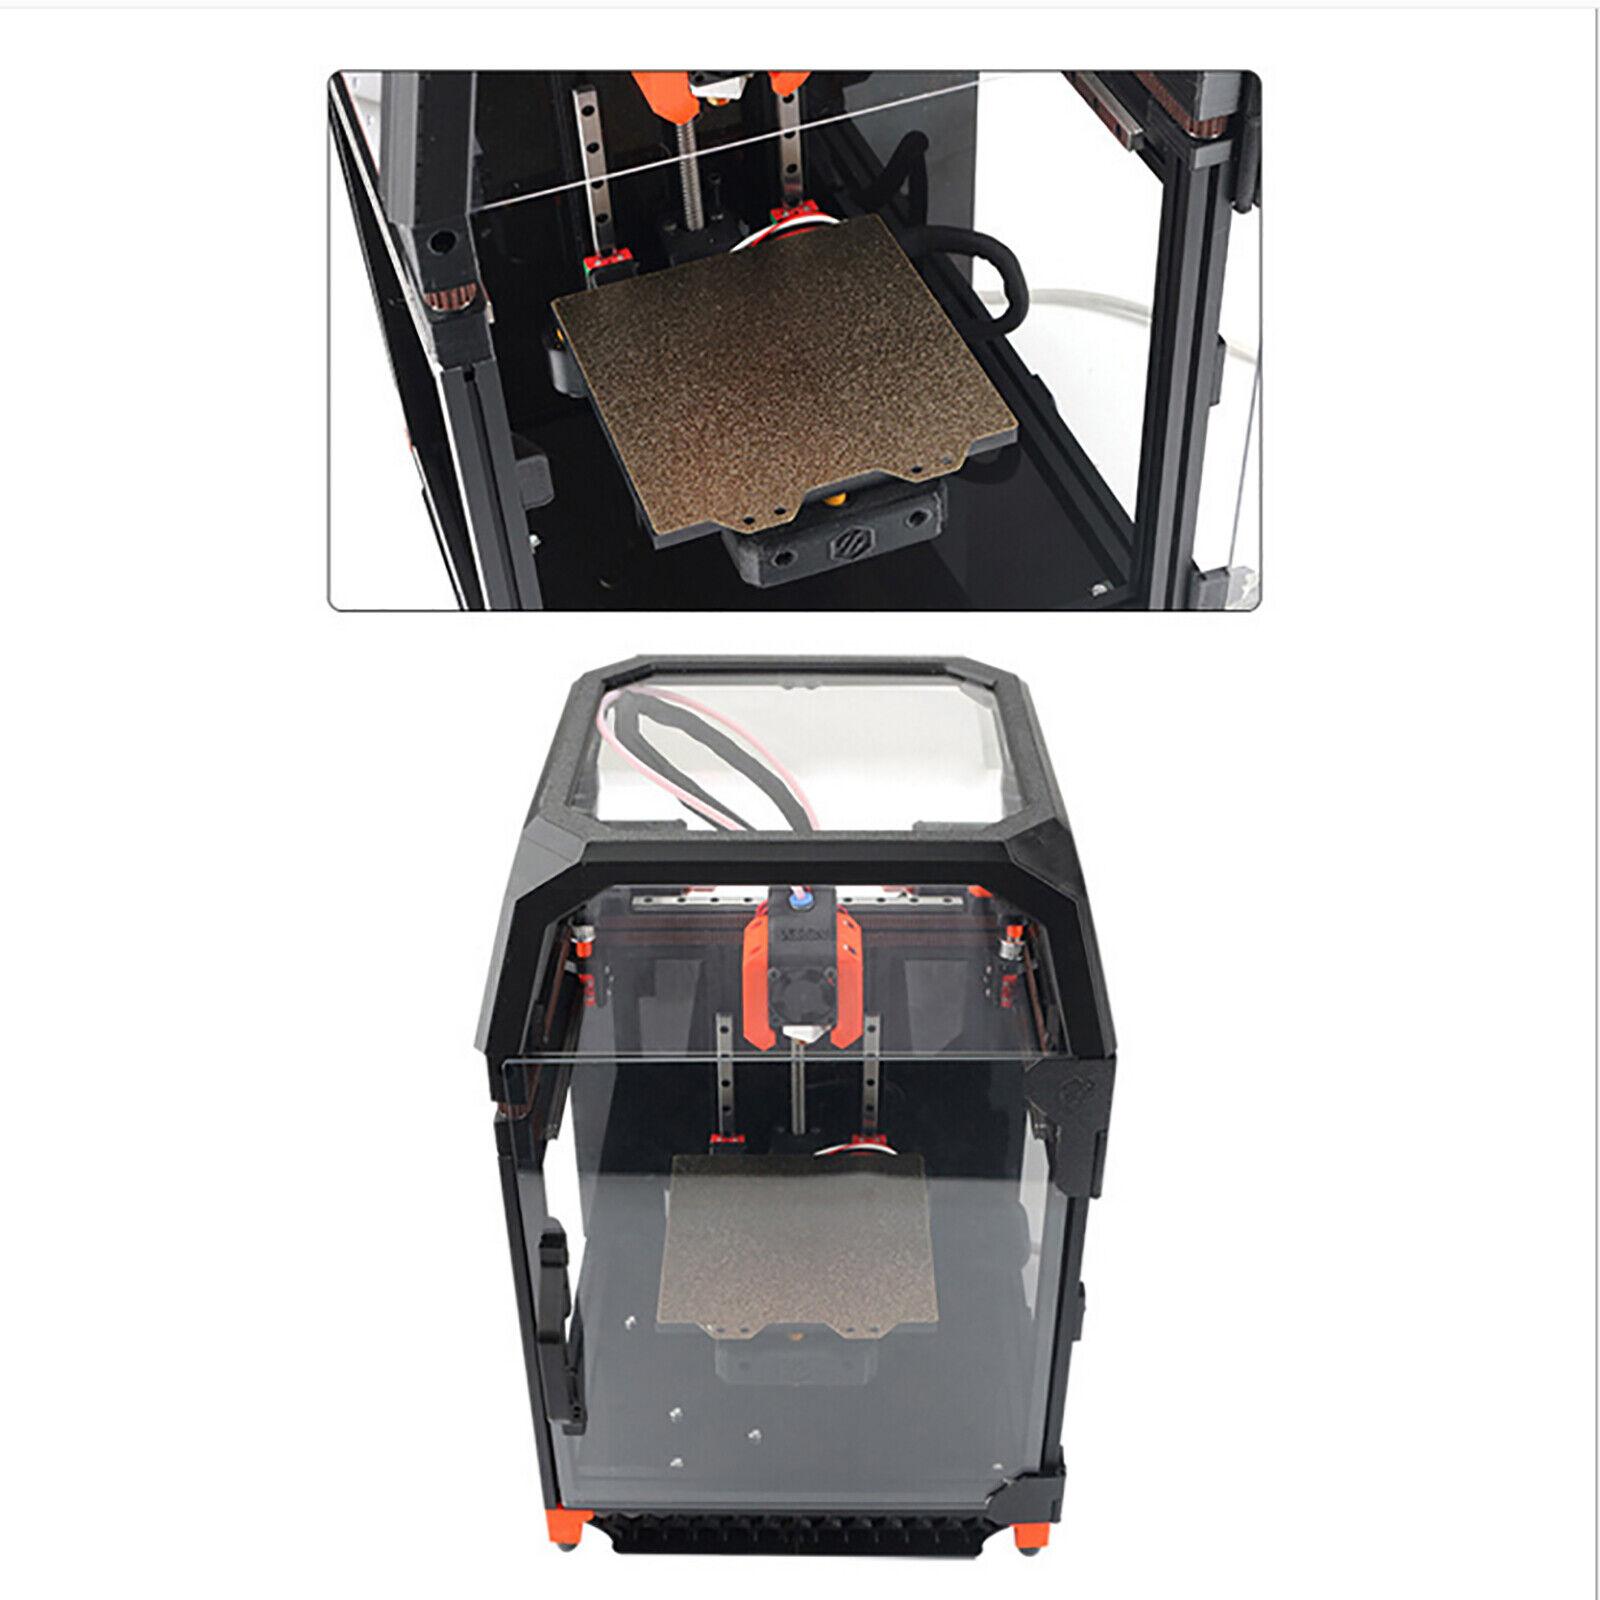 For VoronV0 3DPrinter PEI Textured Powder-Coated Steel Sheet Heated Bed Sticker